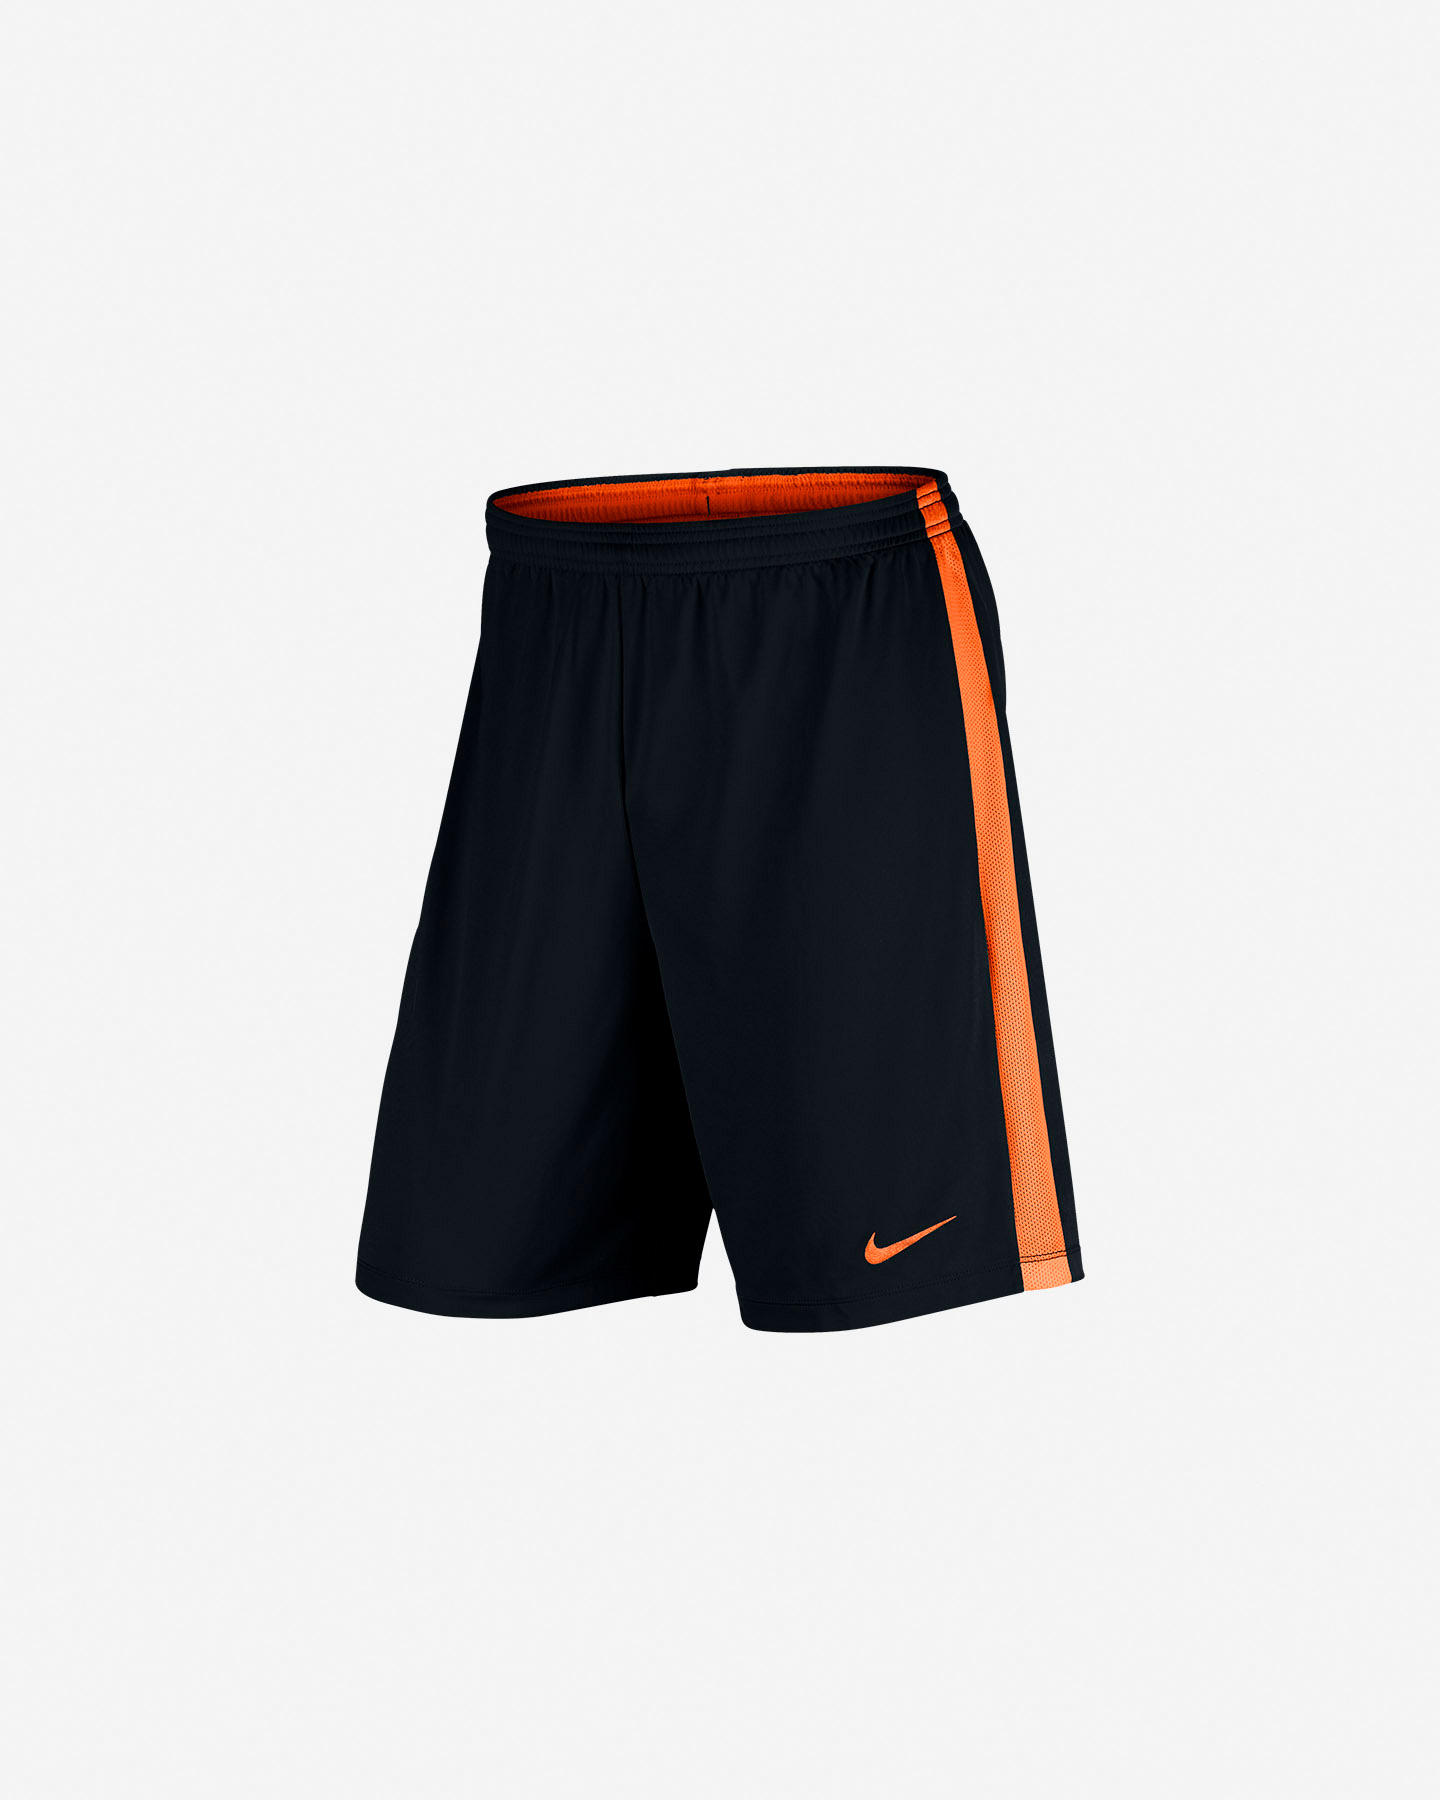 nuovo stile 856fc a9451 Pantaloncini Calcio Nike Dry Acadmy M 832508-015 | Cisalfa Sport